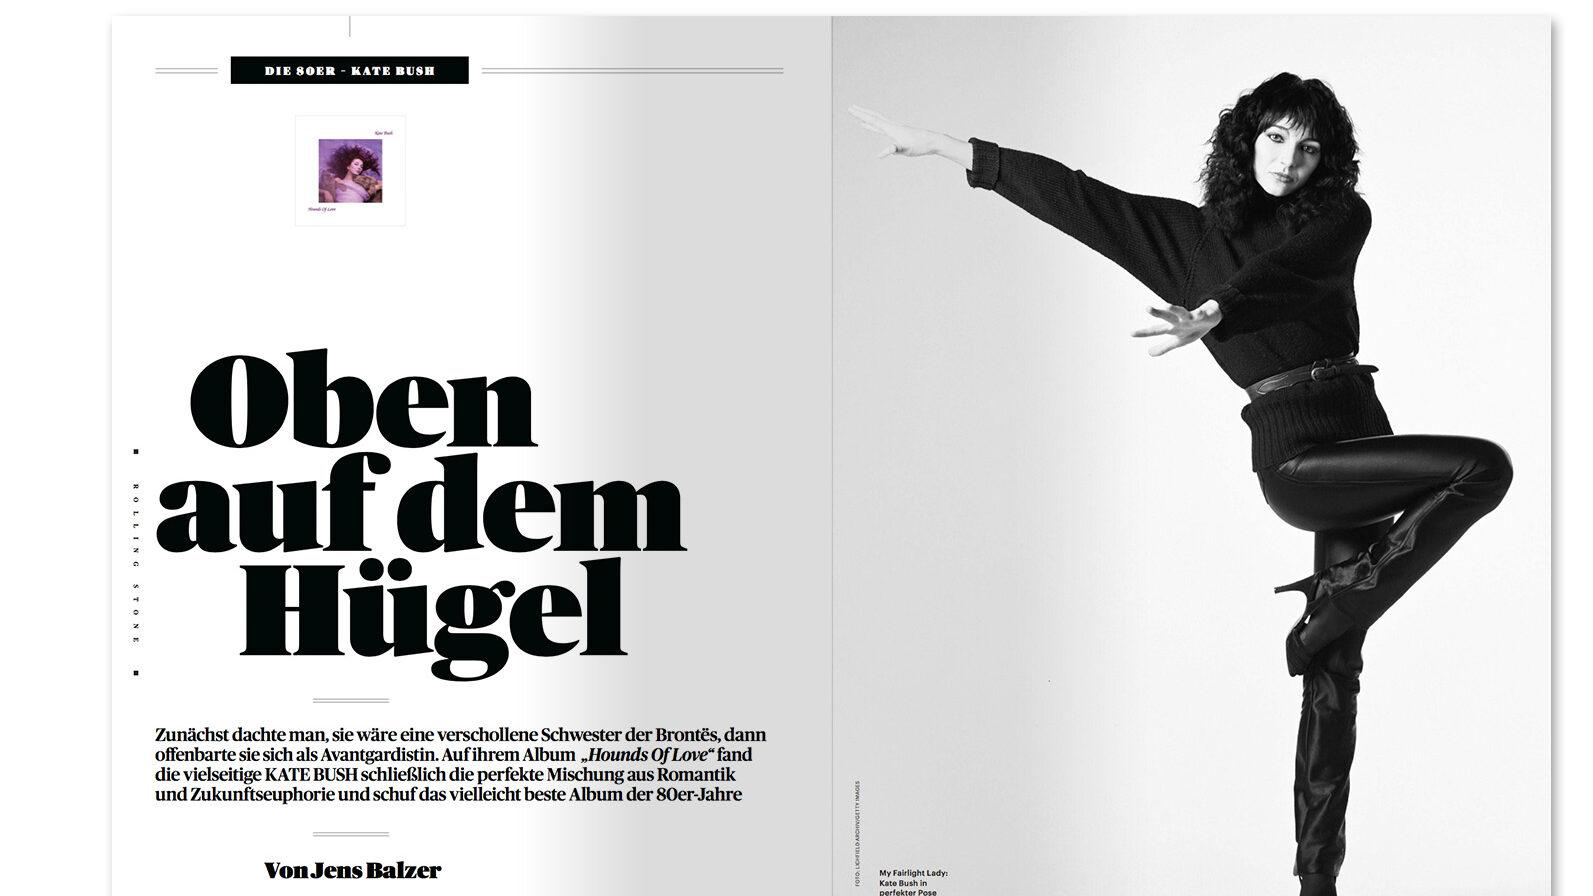 Kate Bush article in June 2021 German Rolling Stone